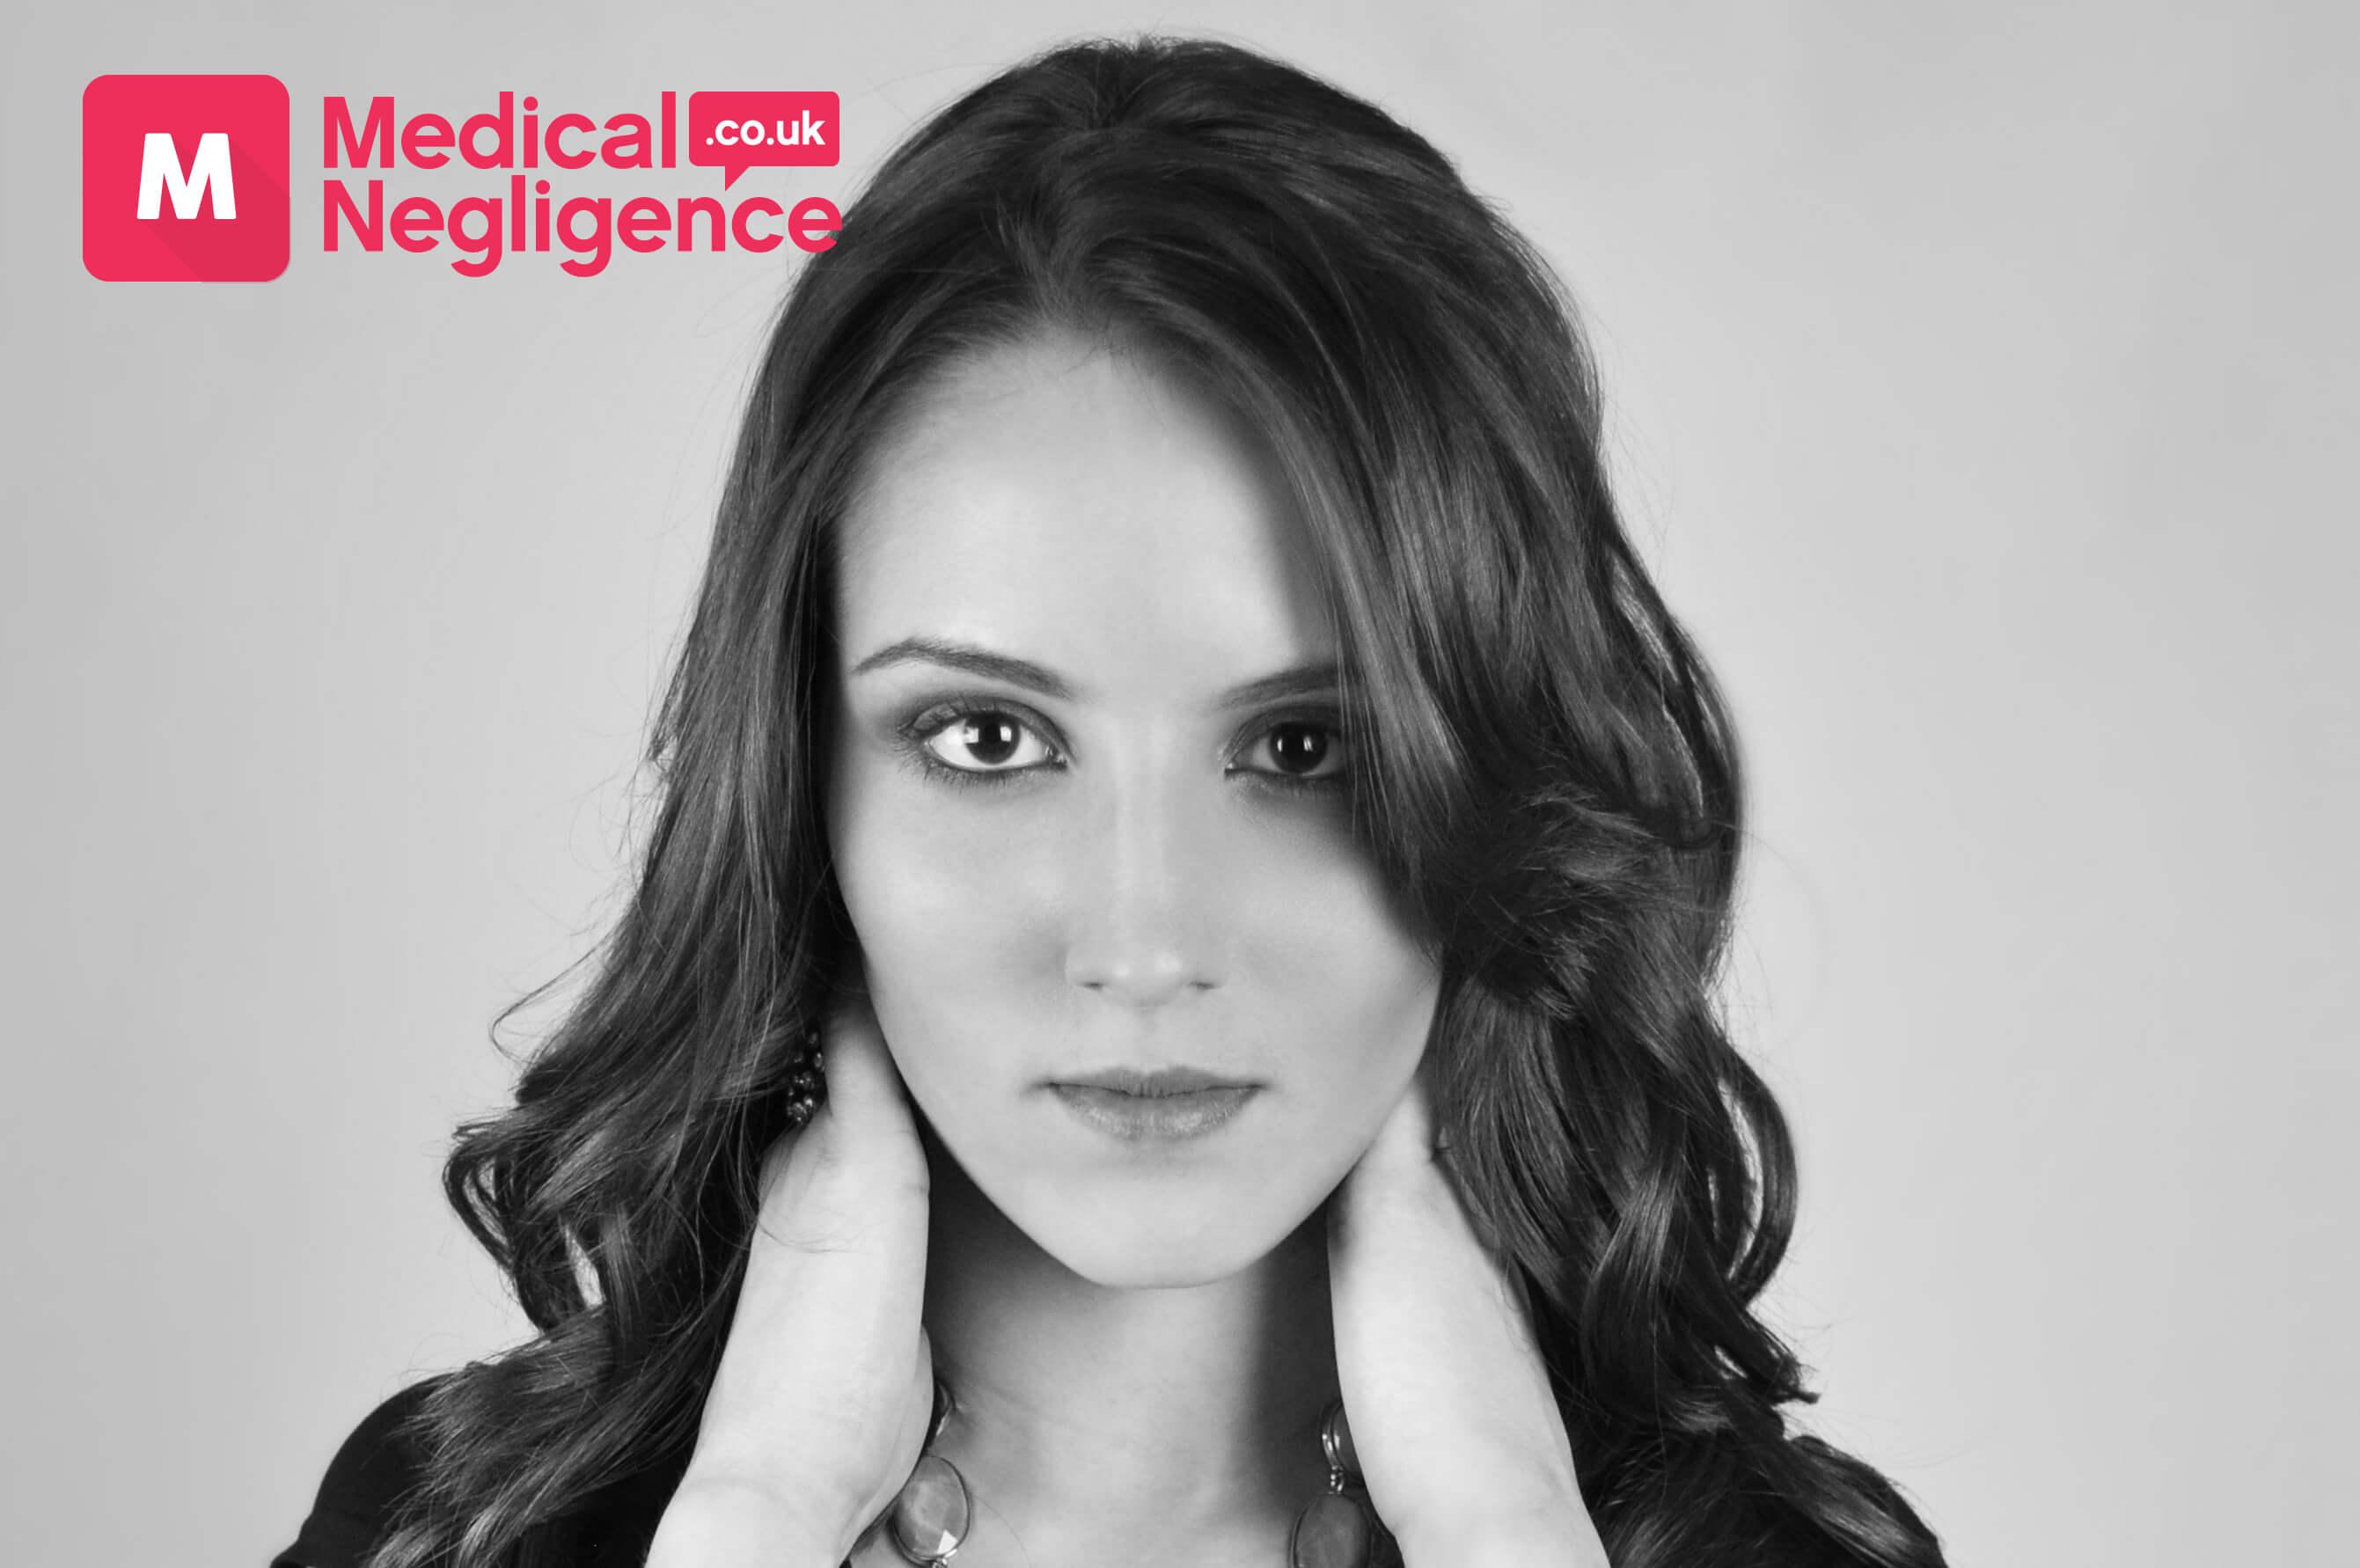 Cancer Misdiagnosis Claim - Female